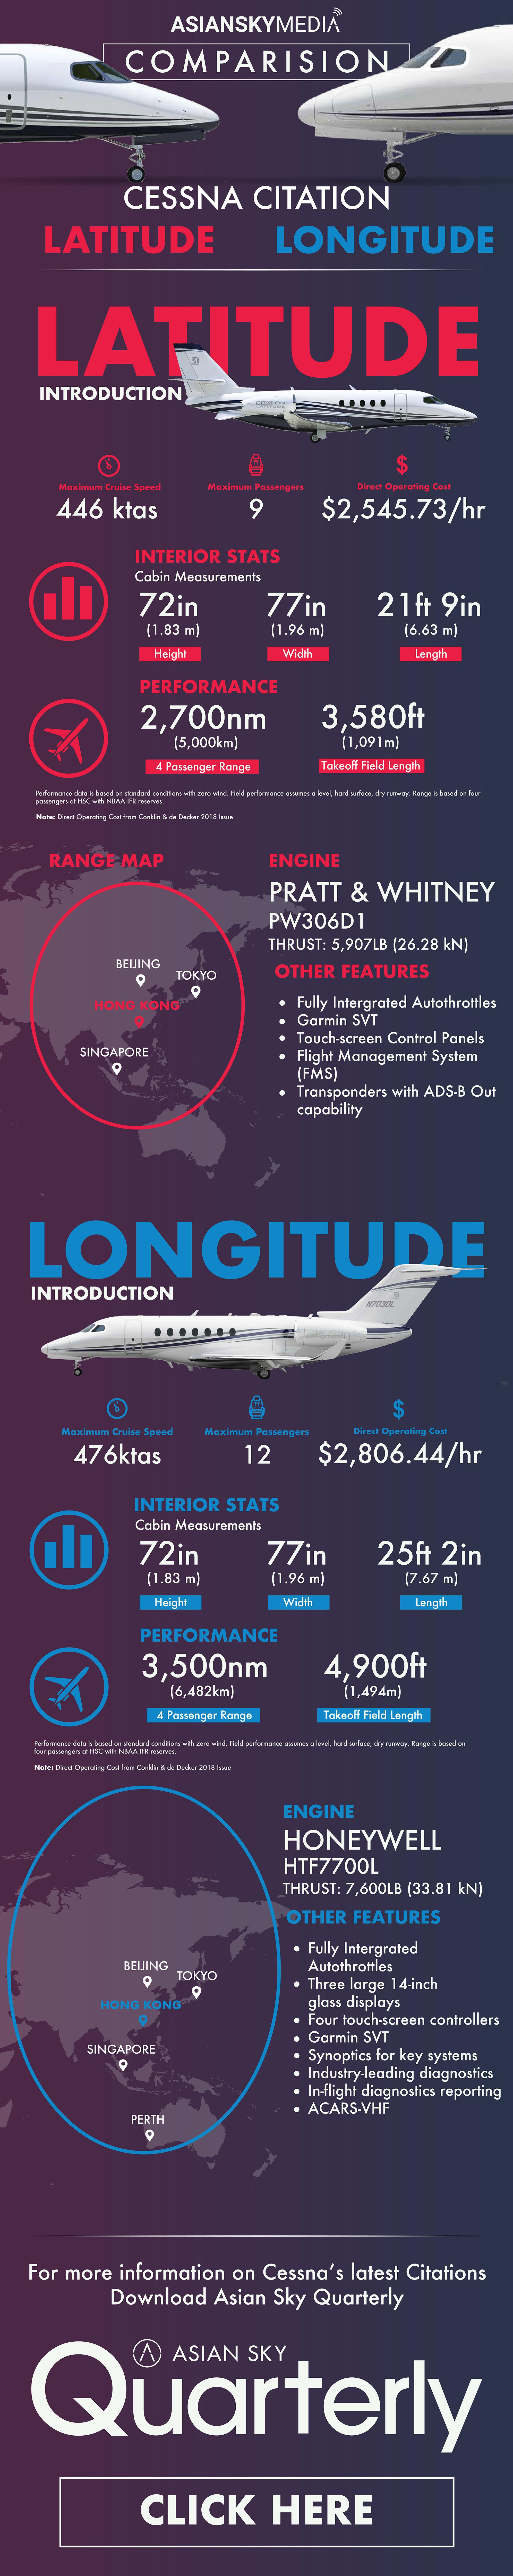 Longitude and Latitude_FINAL.jpg